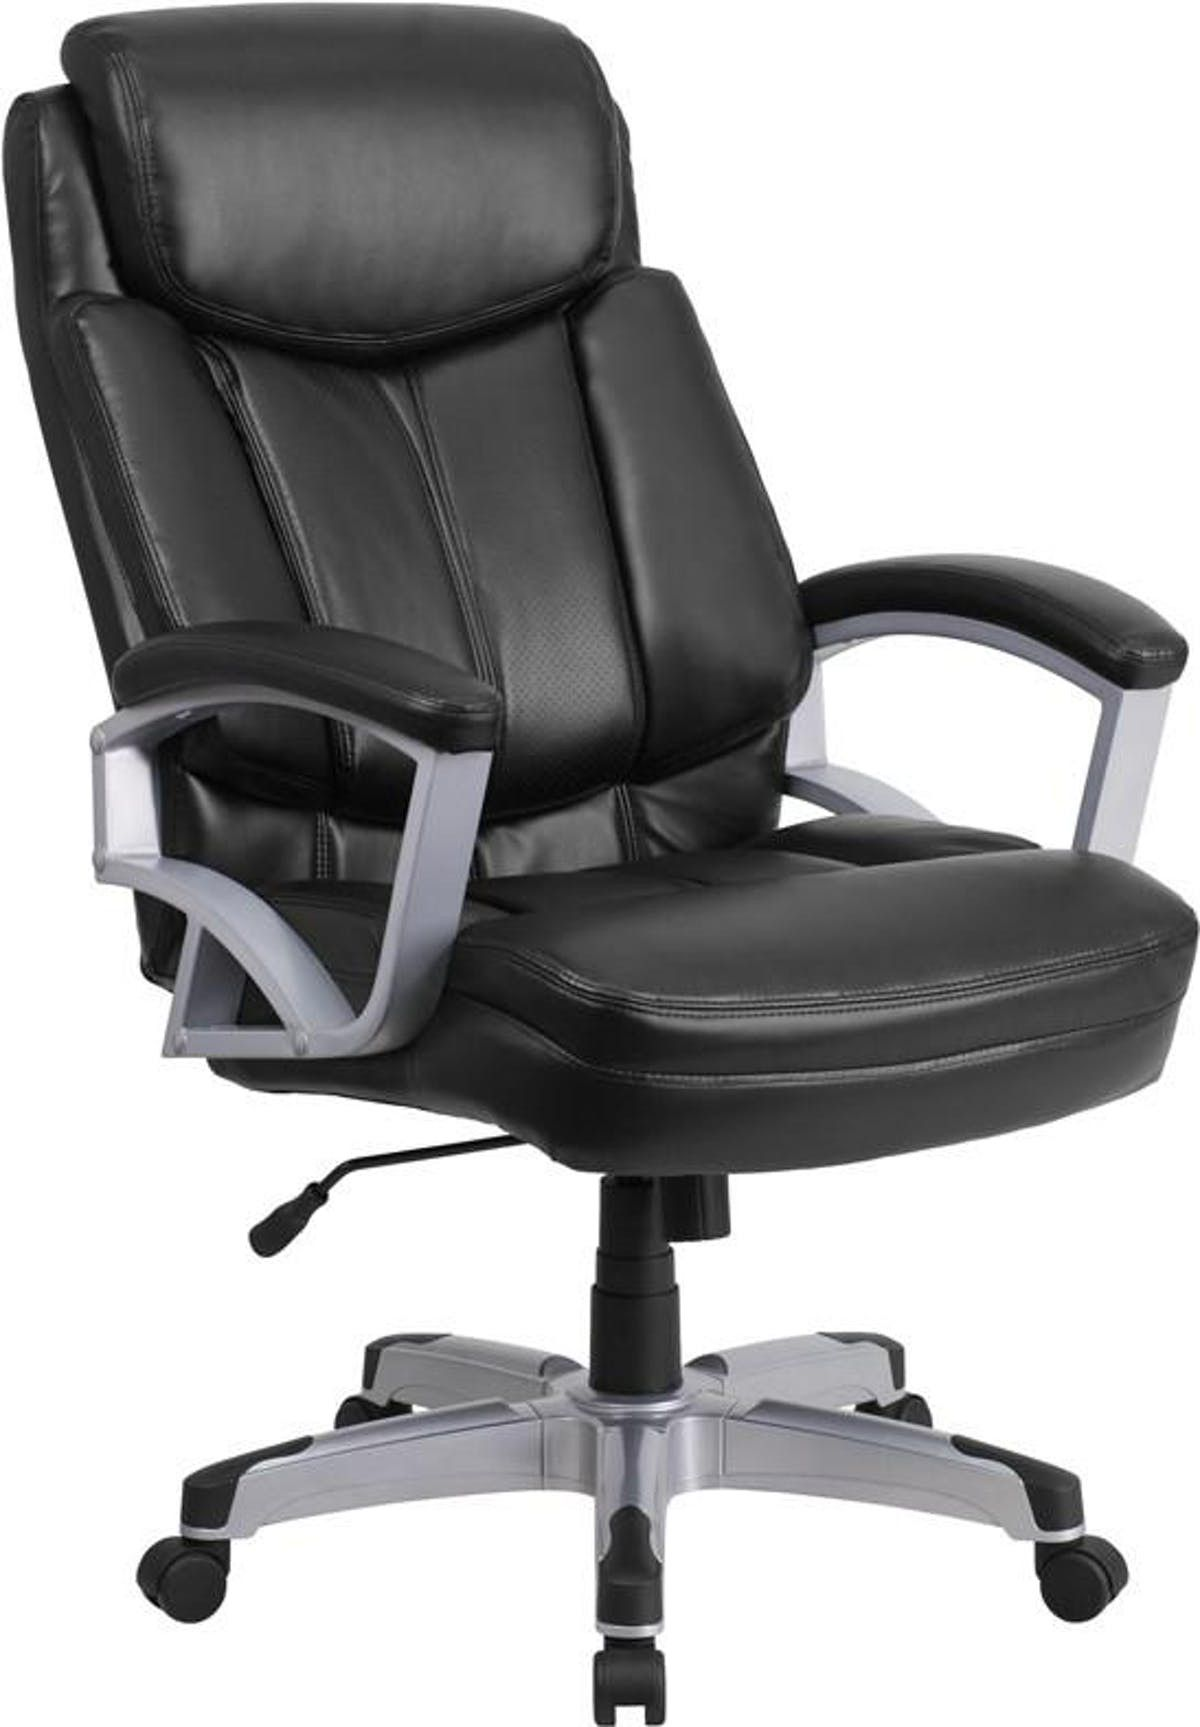 Hercules Office Chair 2021 Di 2021